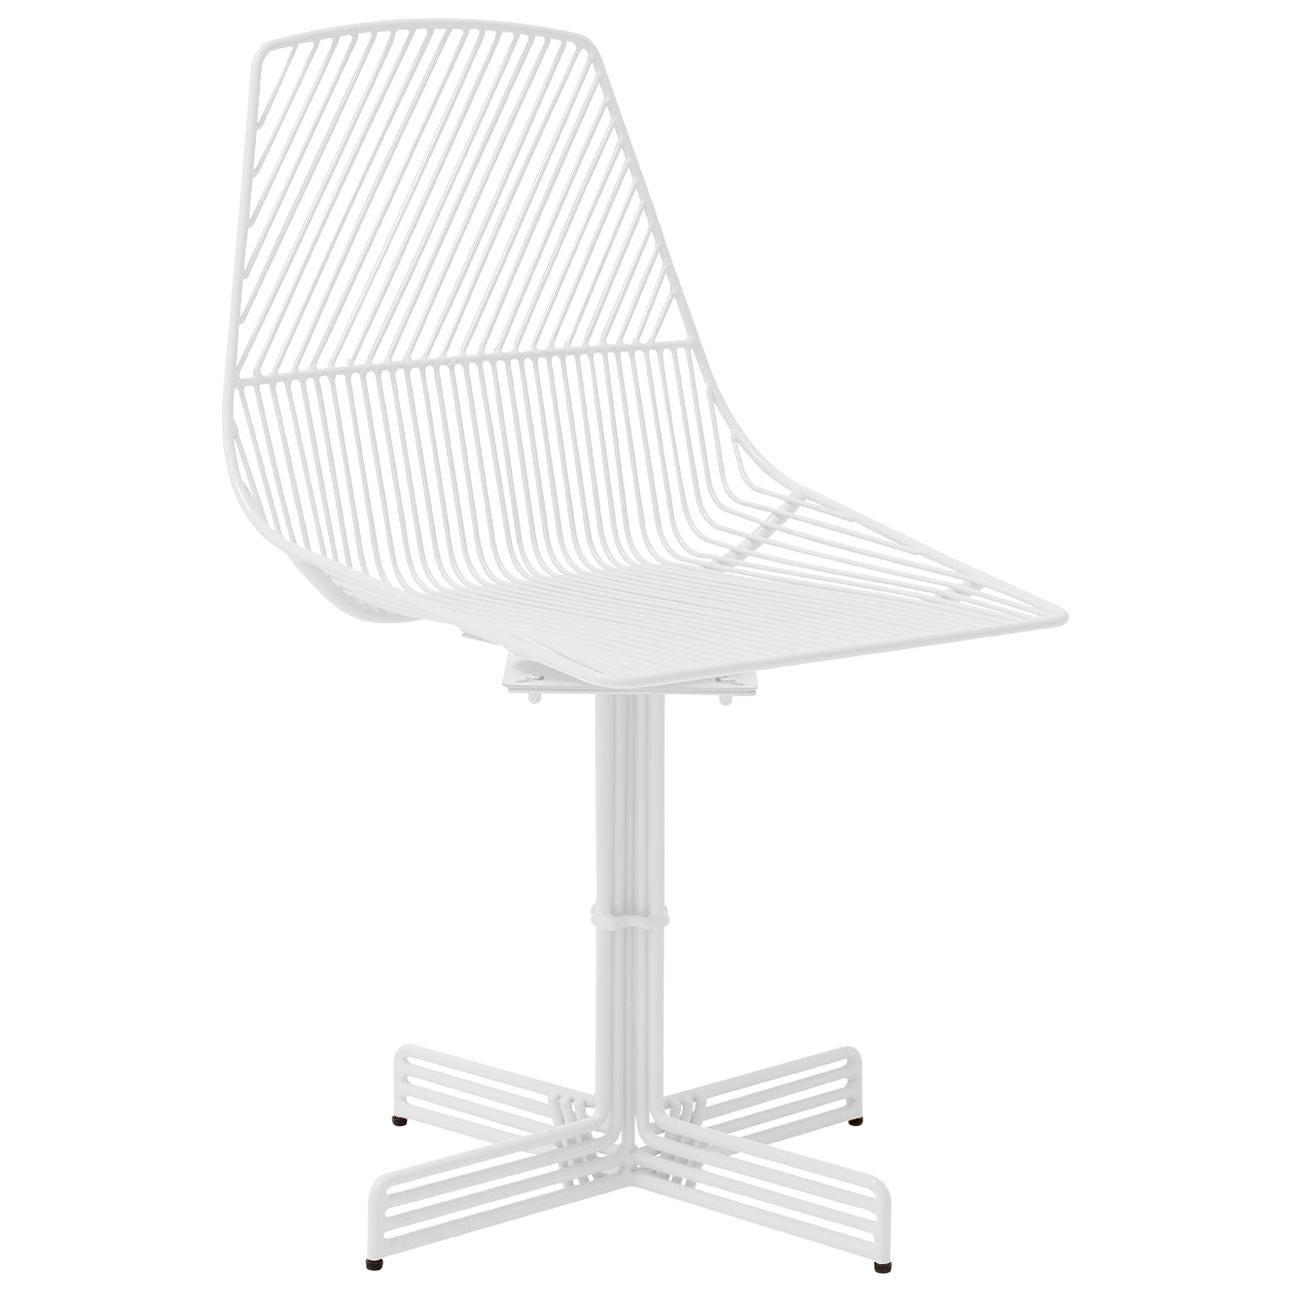 "Swivel Chair ""Swivel Ethel"" in White by Bend Goods"